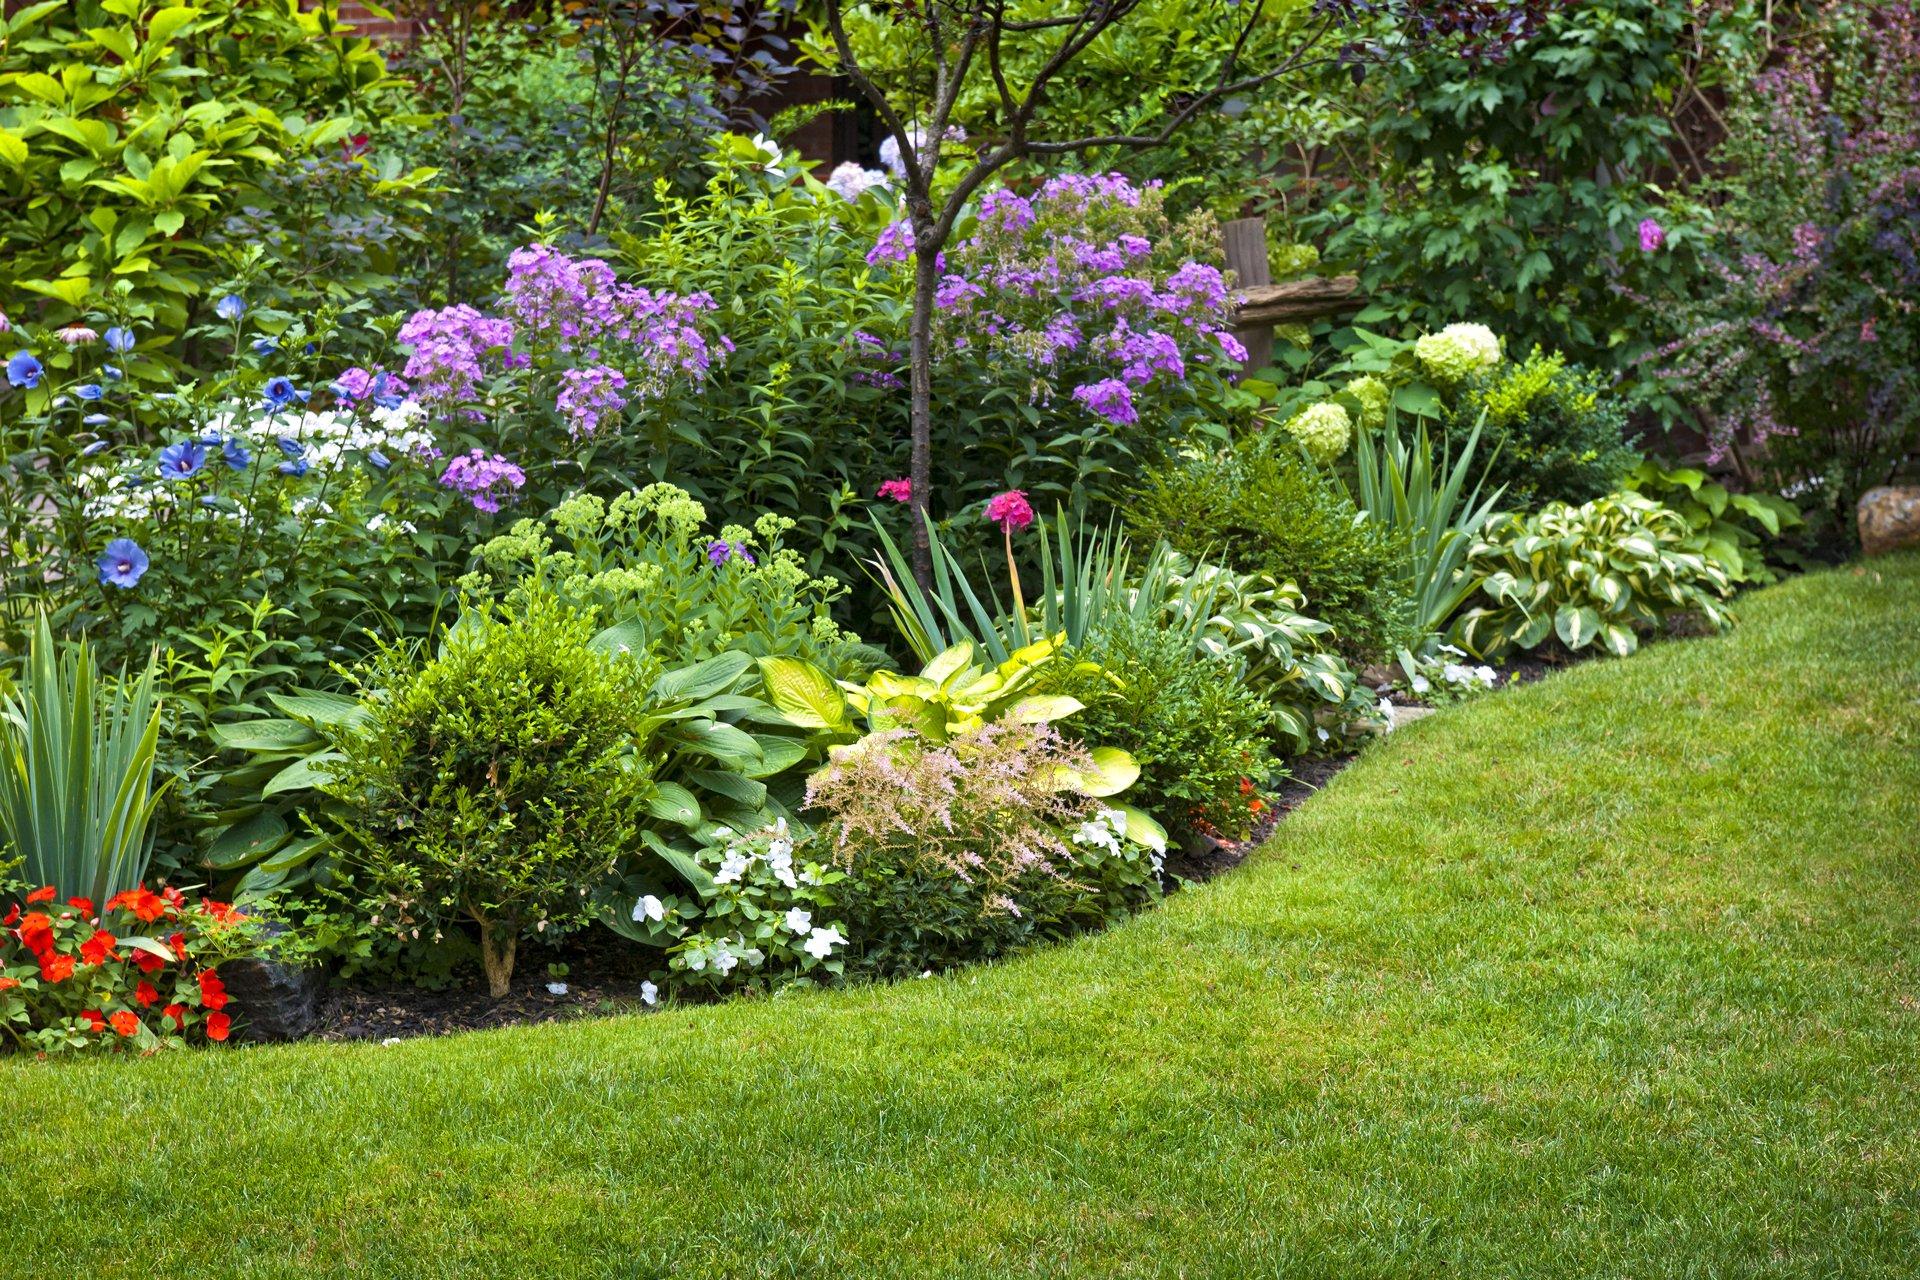 Beautiful green garden with flowers